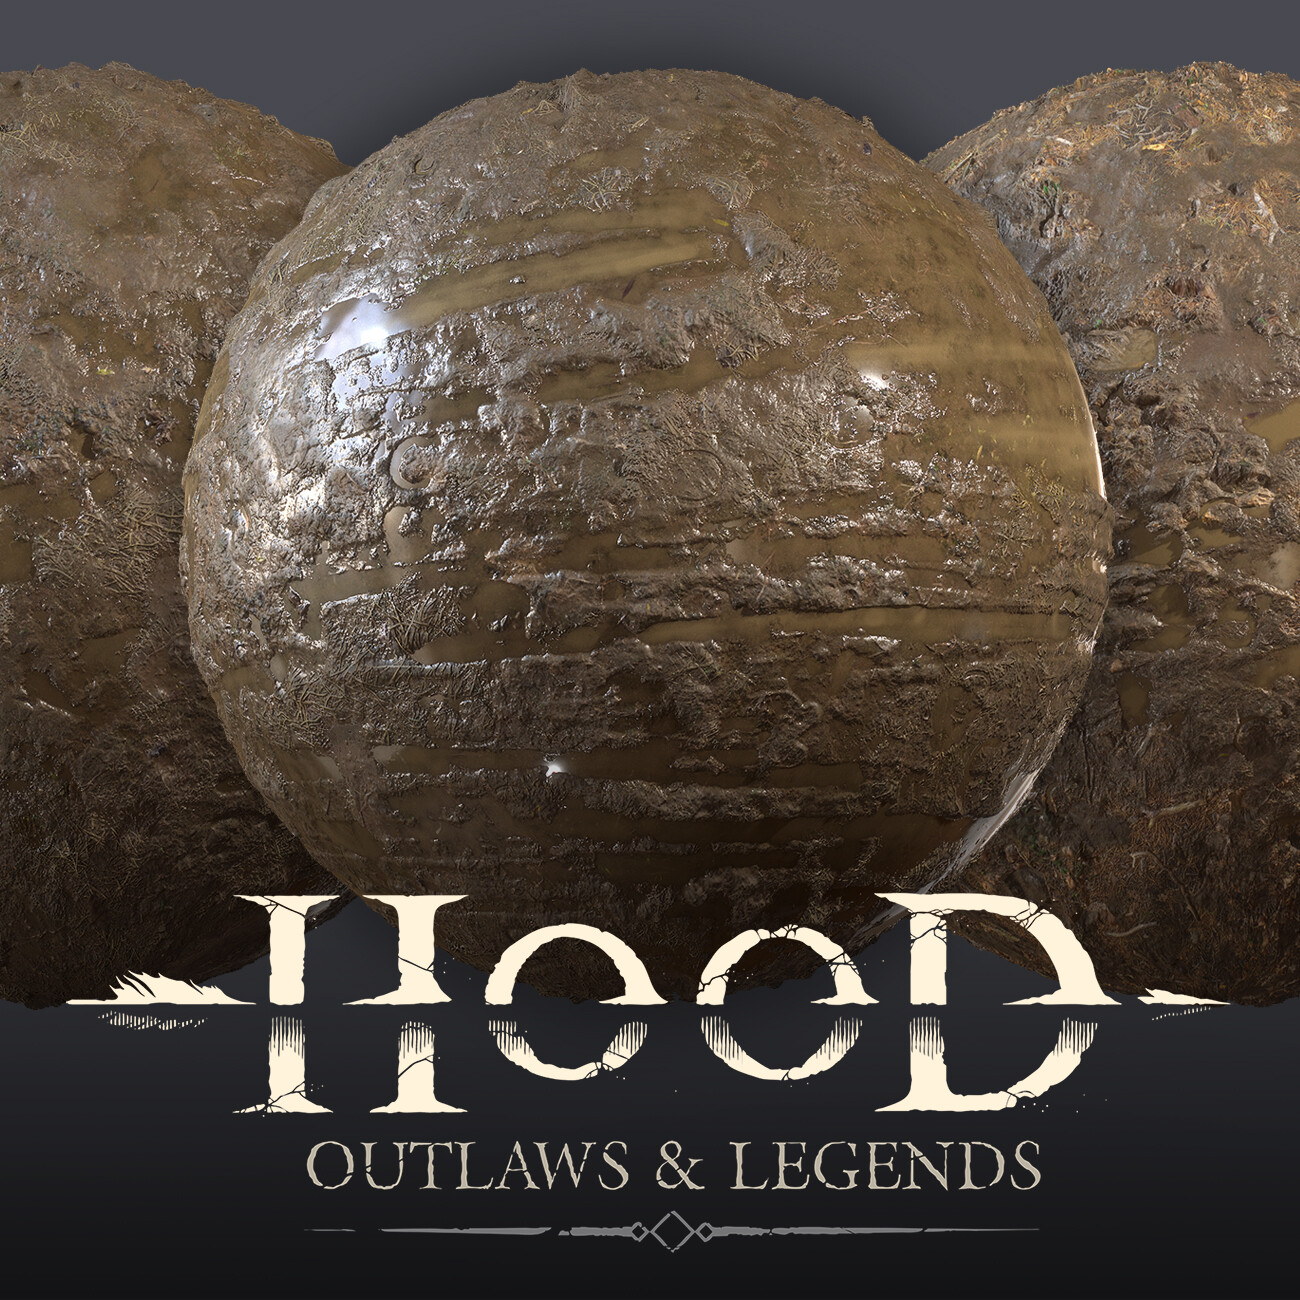 Hood: Outlaws & Legends - Mud Tracks Materials